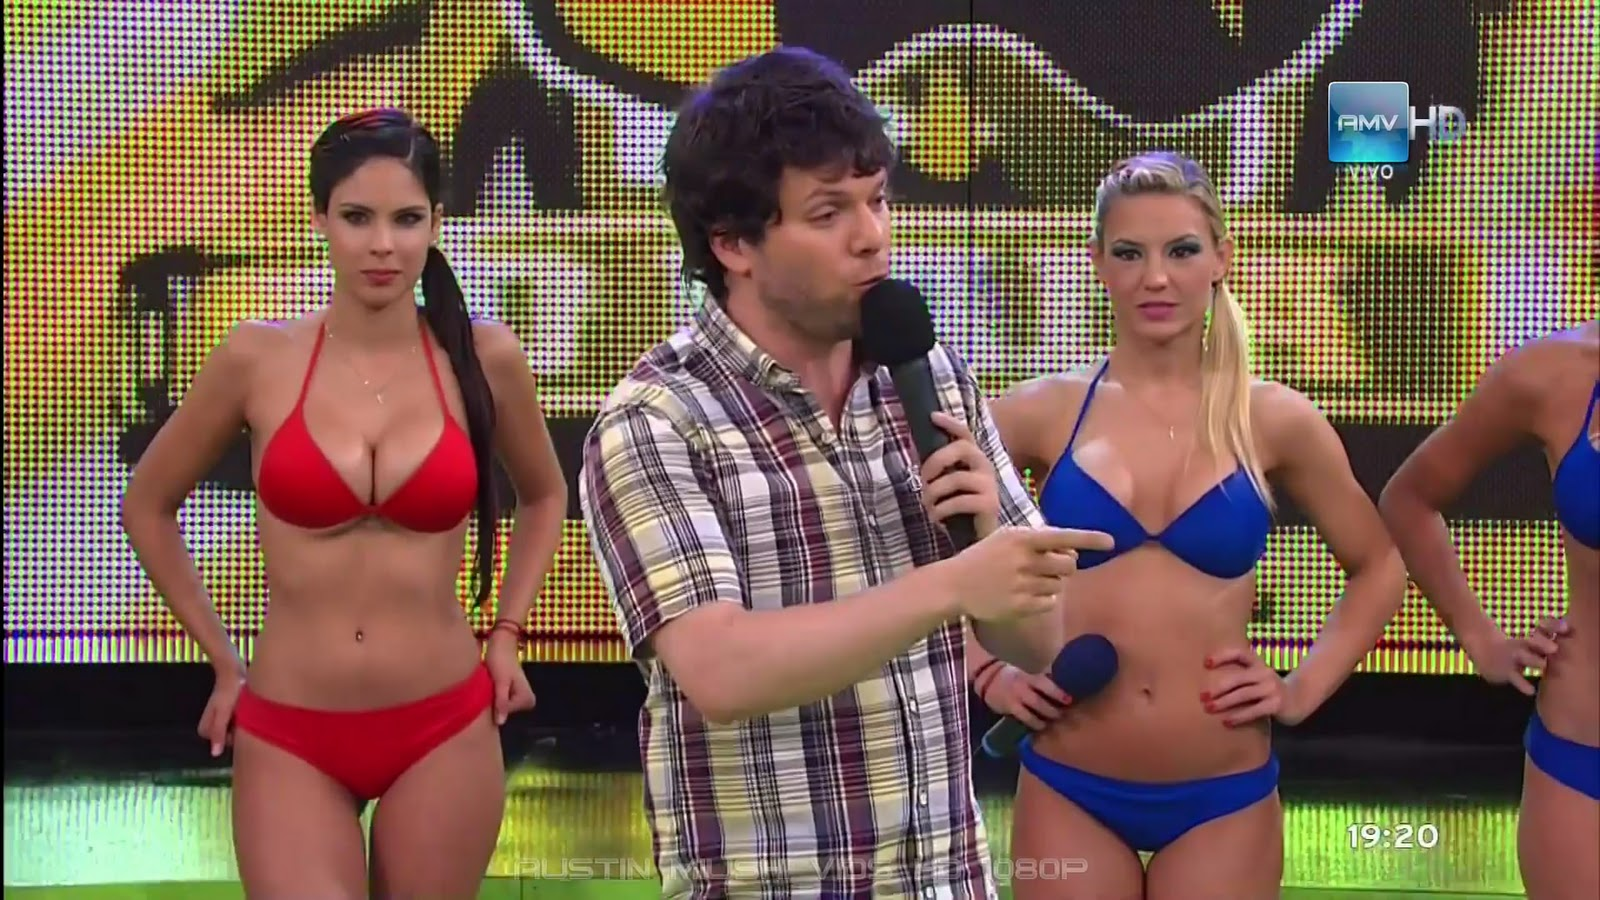 image Azafatas programa de argentina